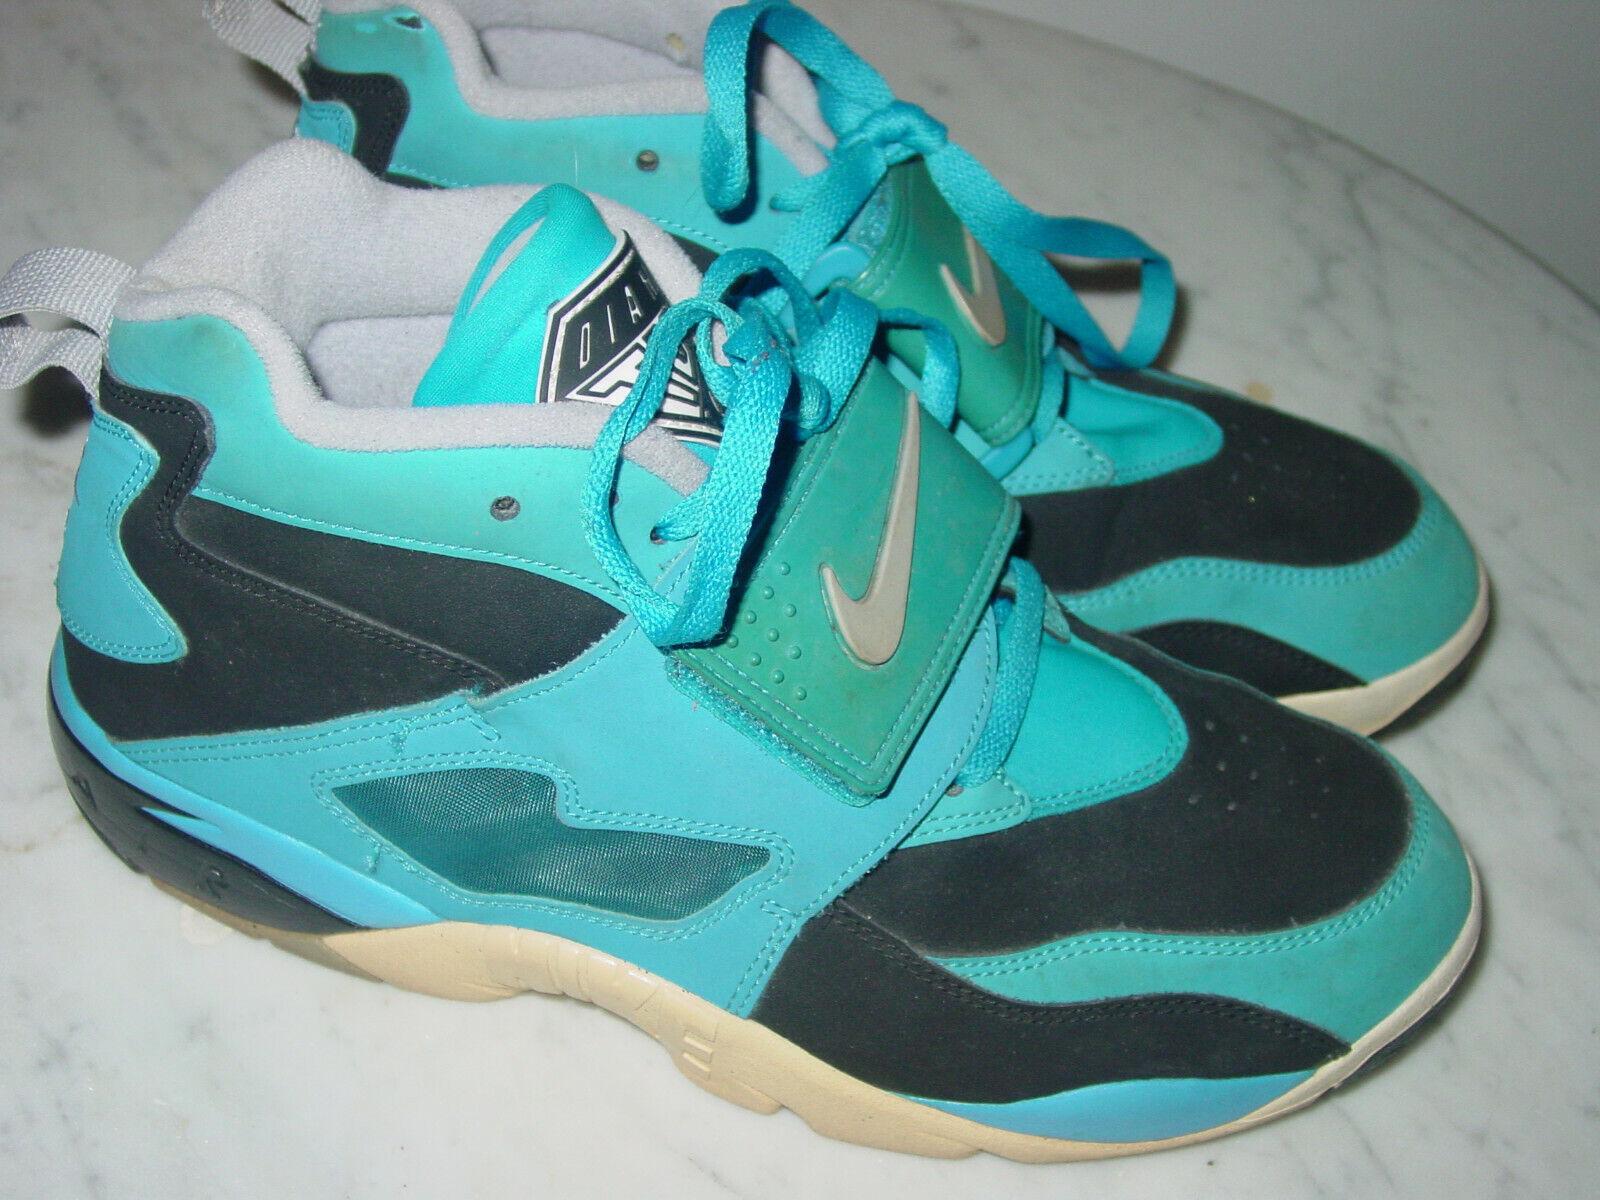 2013 Nike Air Diamond Turf Black Wolf Grey bluee Hero Training shoes  Size 10.5